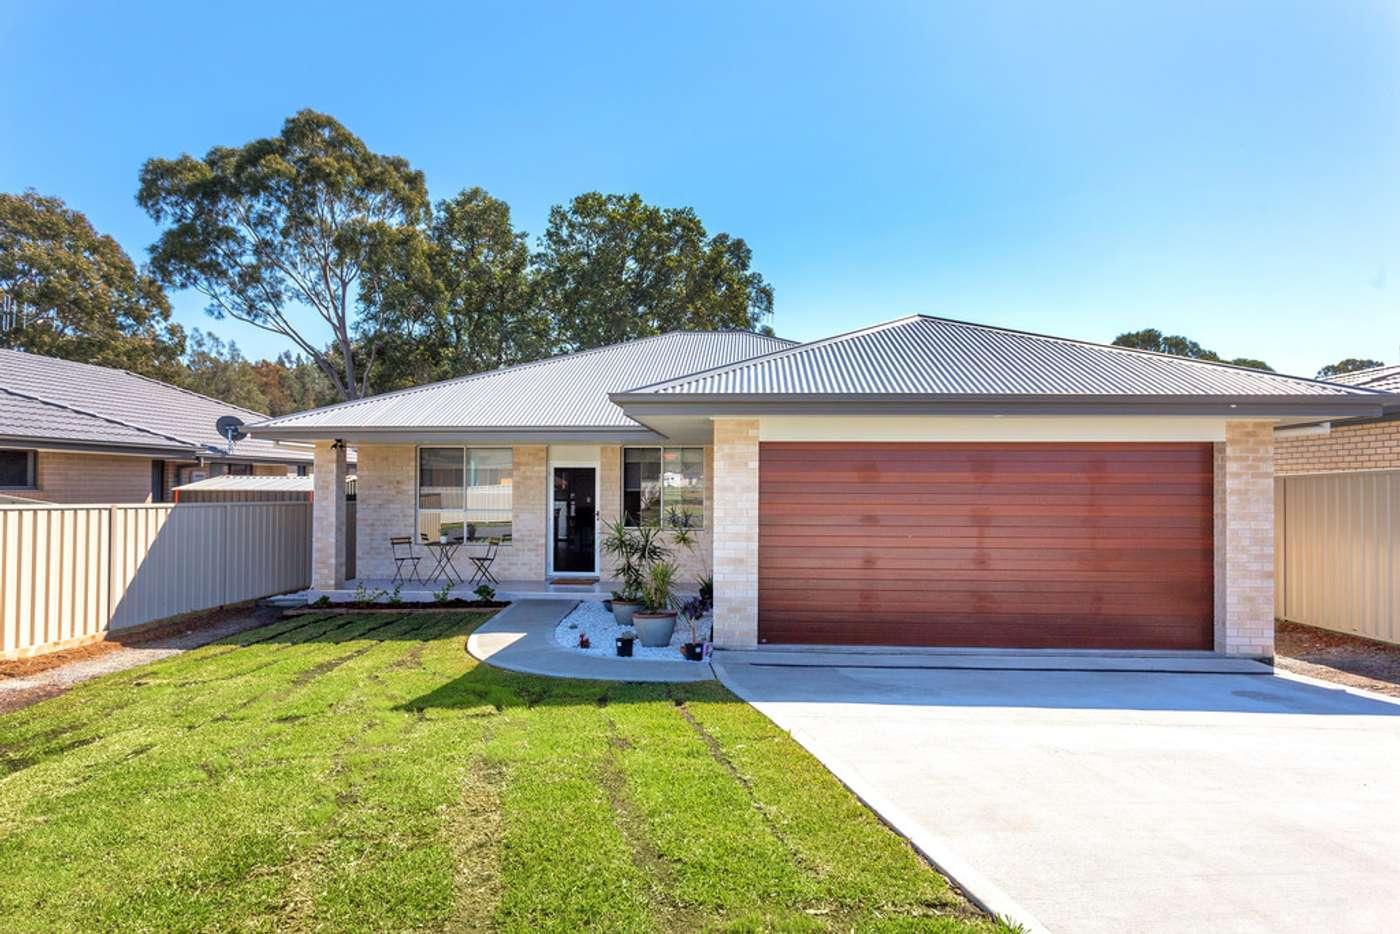 Main view of Homely house listing, 10 Sundara Close, Taree NSW 2430